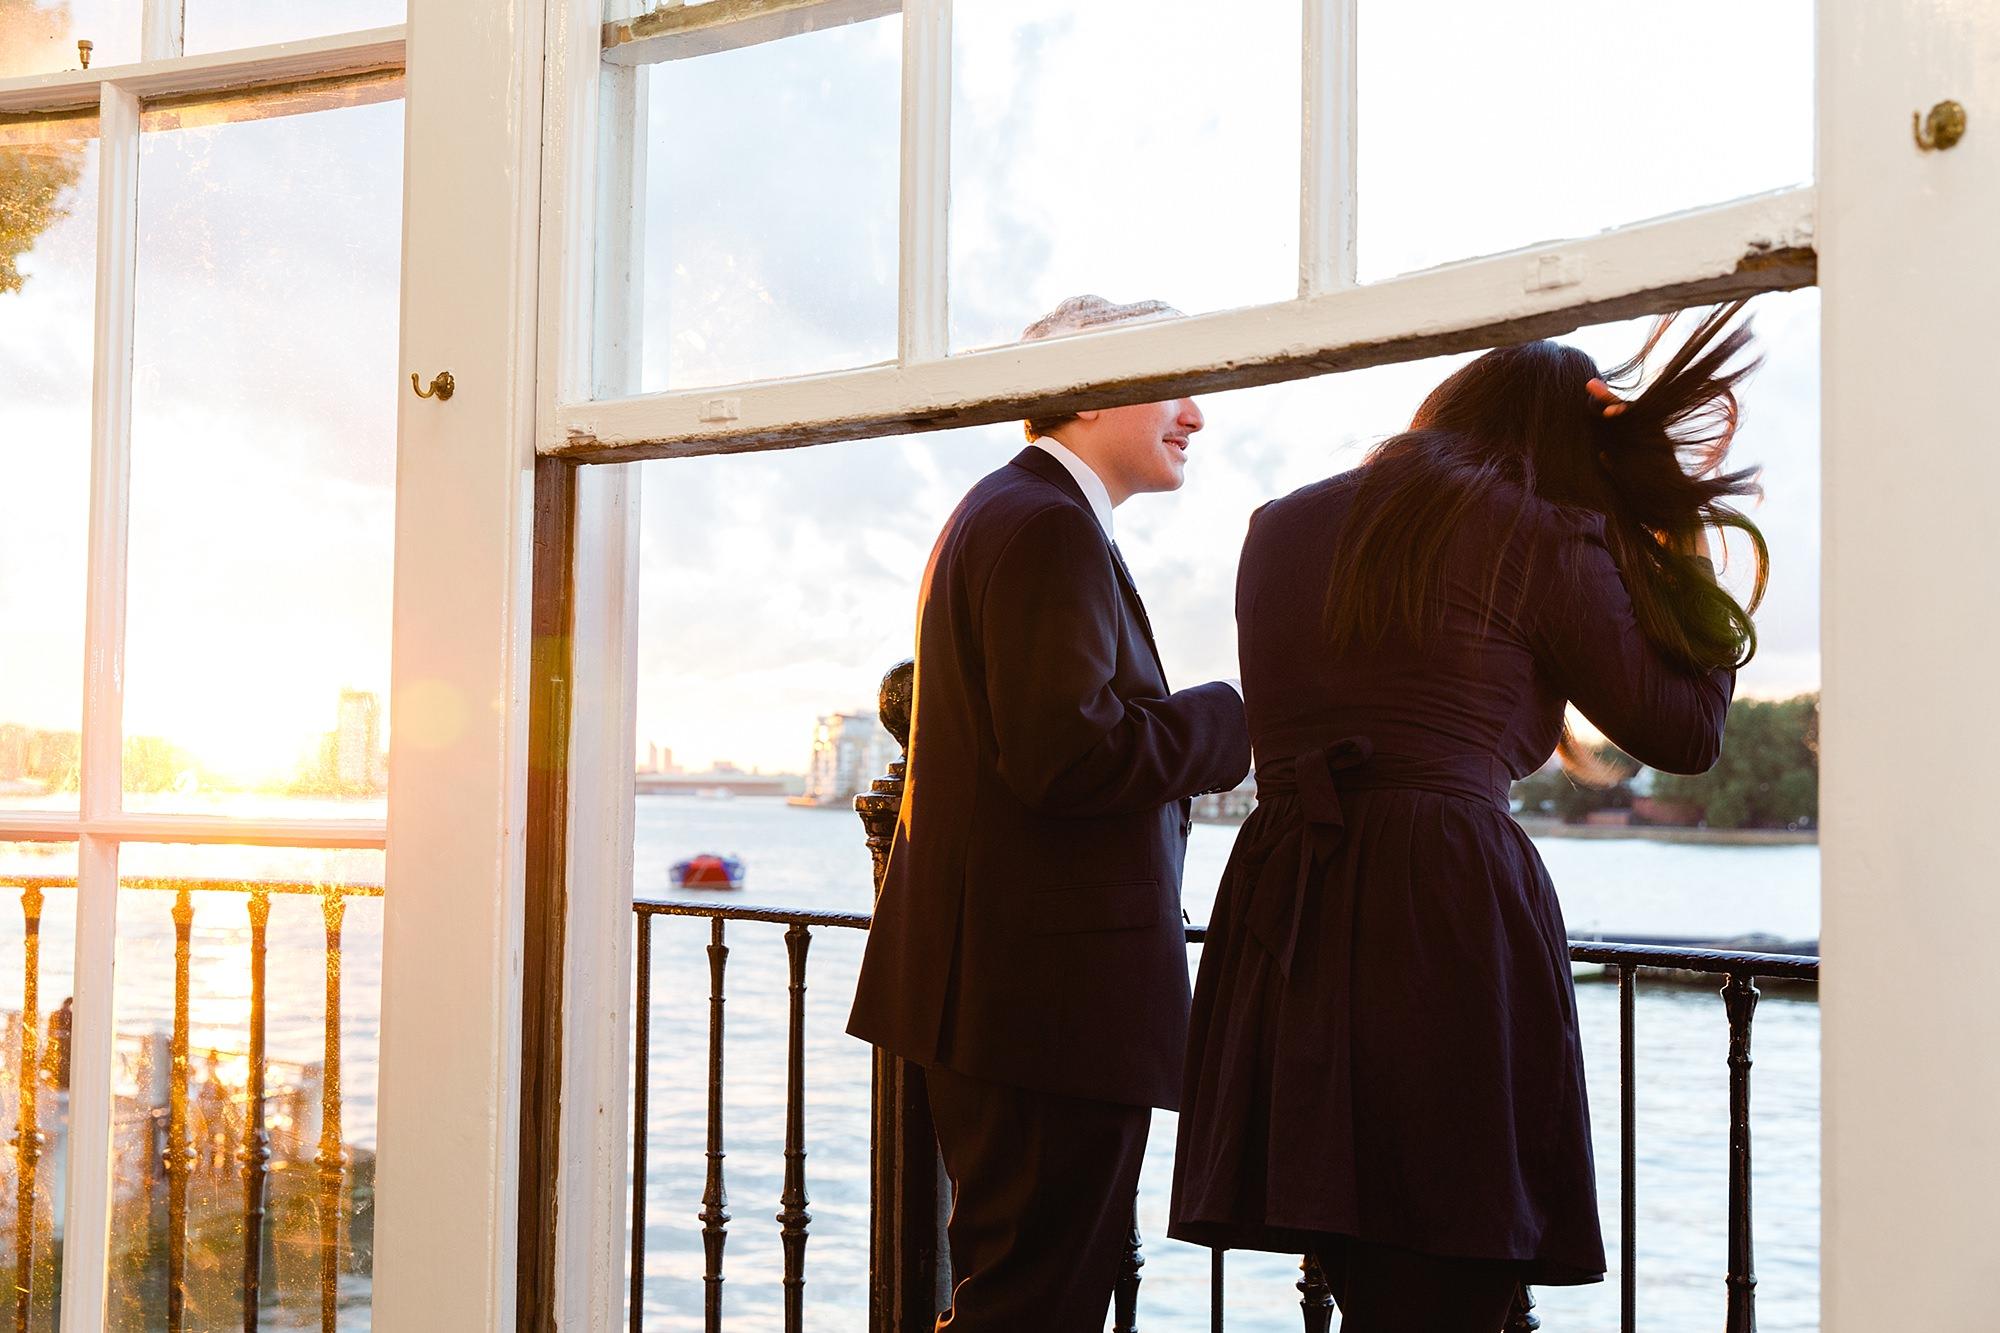 Trafalgar Tavern wedding guests enjoy sunset on the balcony